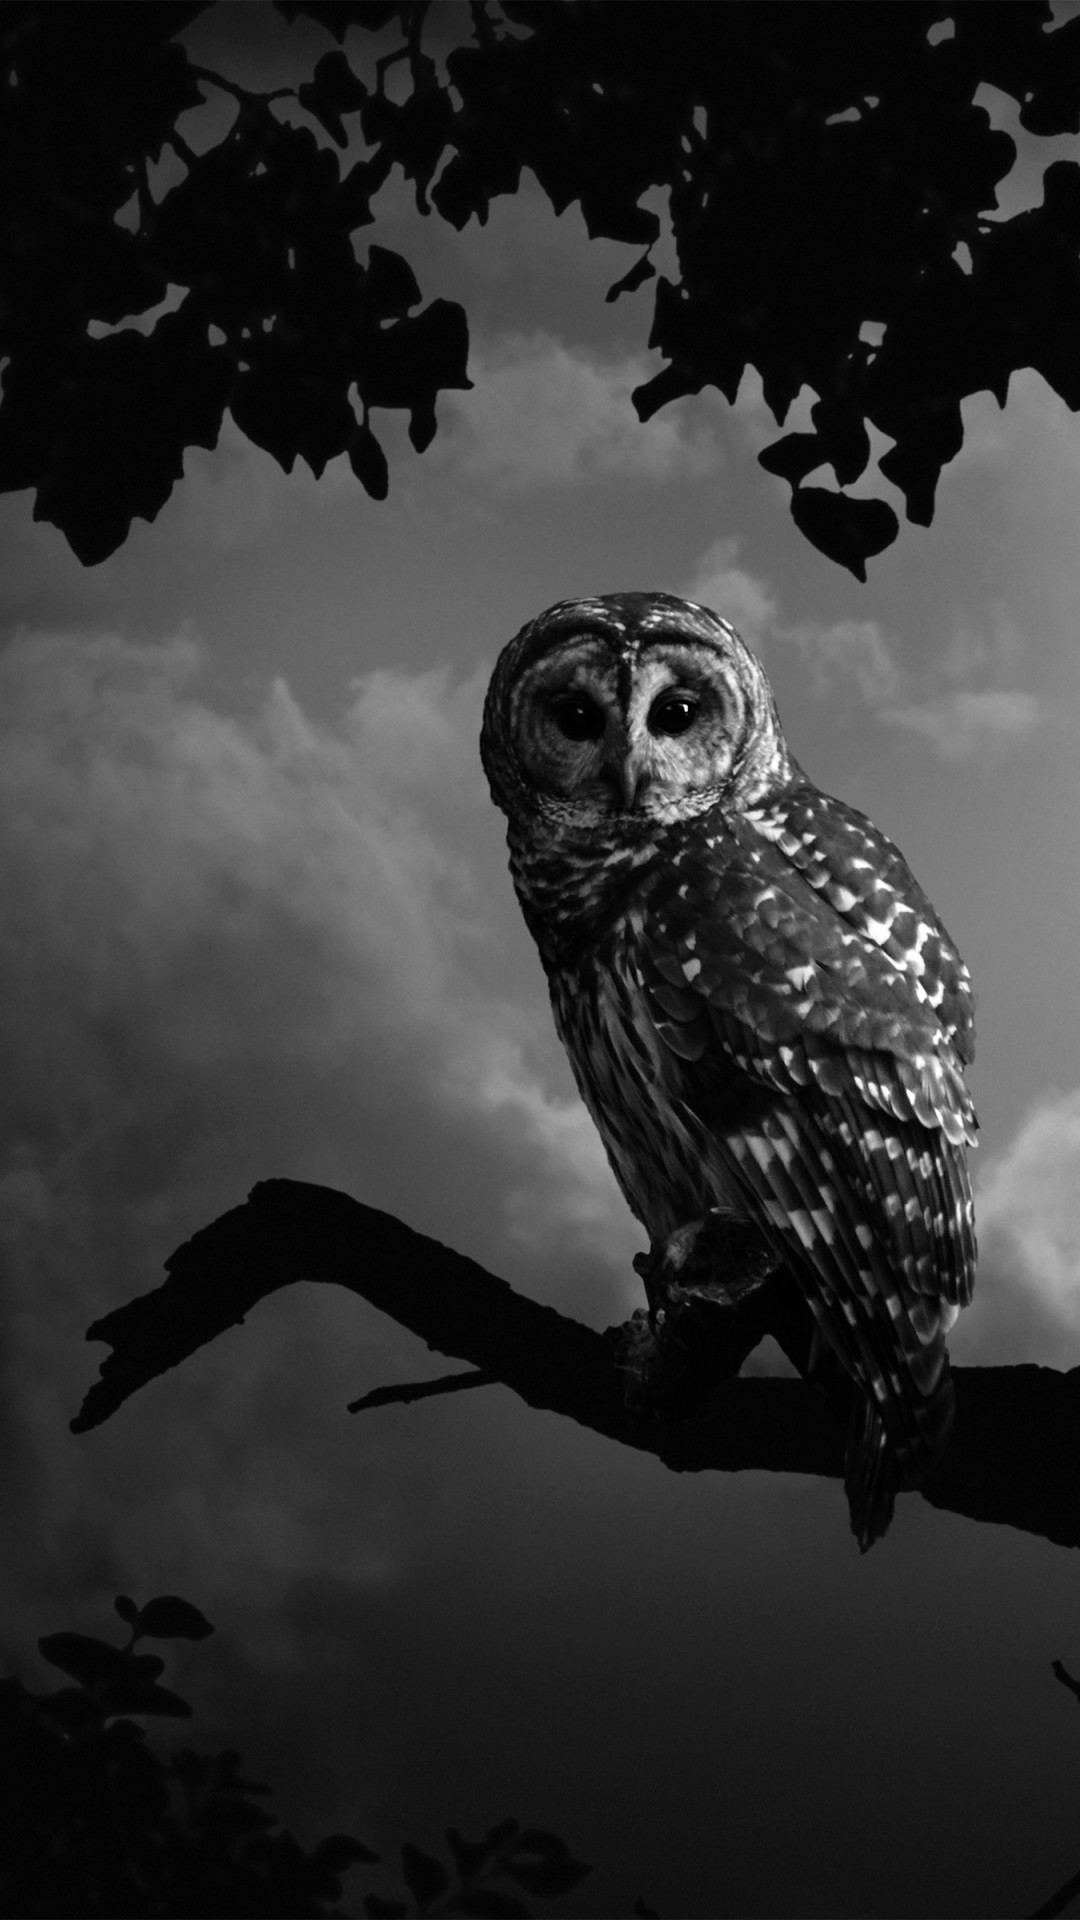 Black and white animals white owl wallpaper x